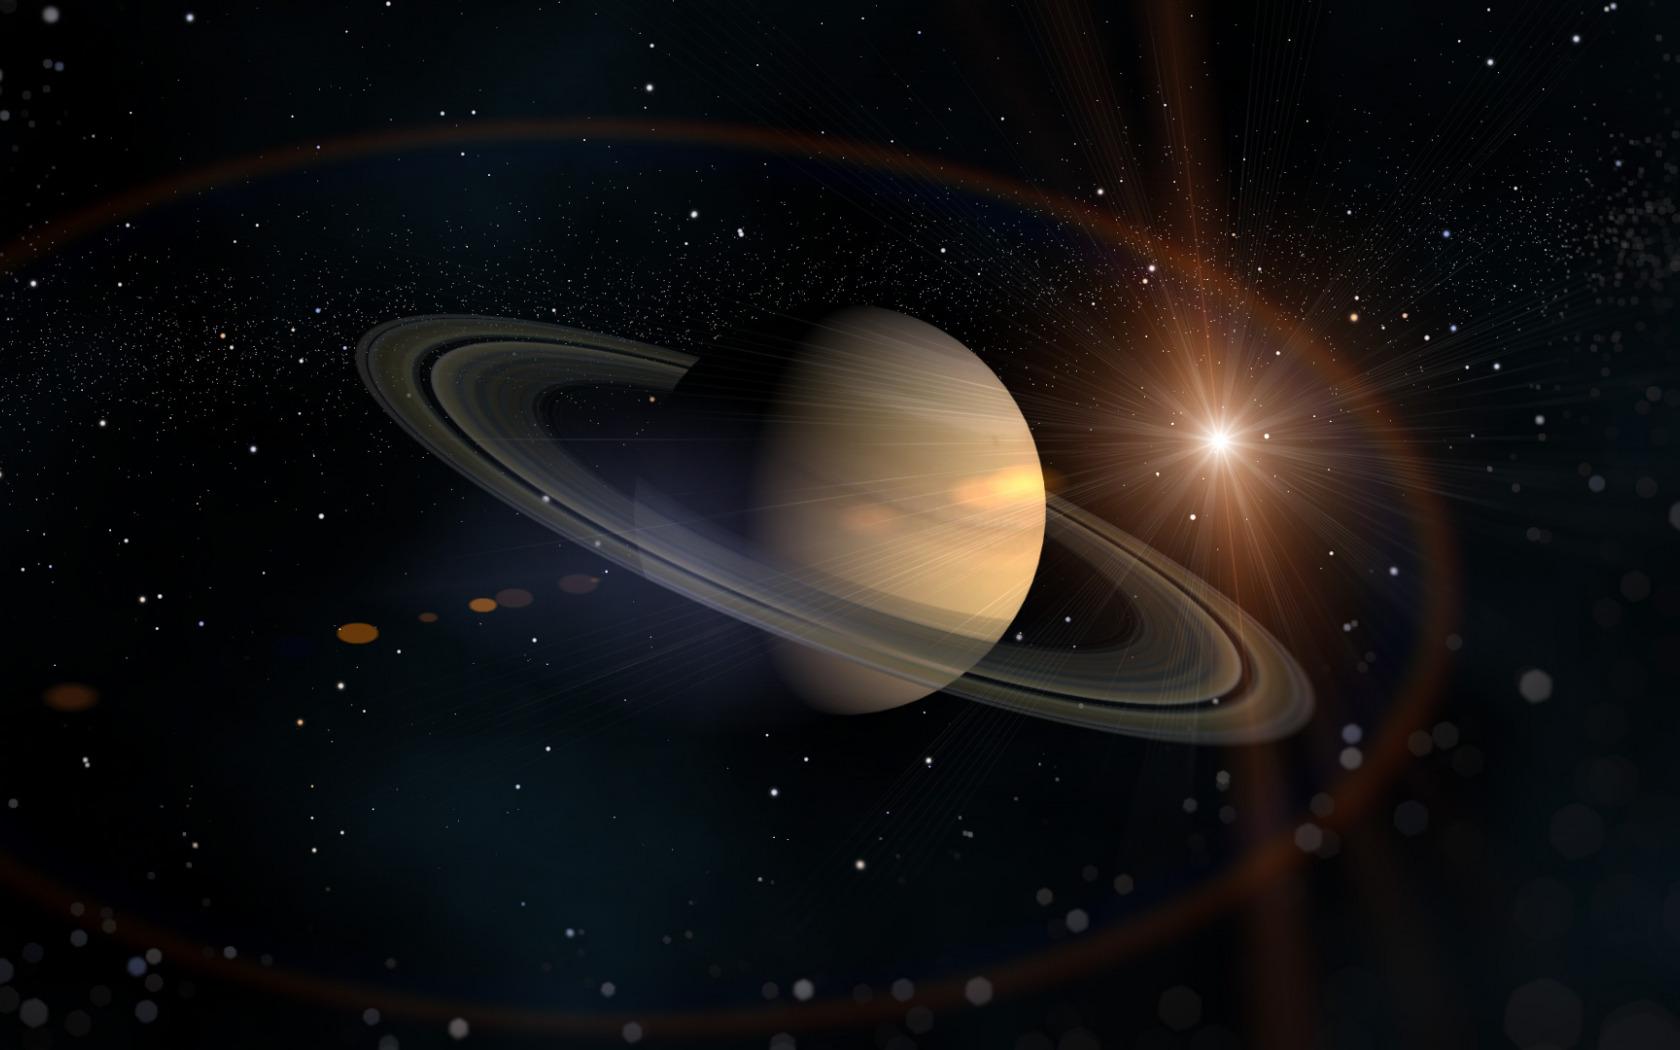 Картинки с планетой сатурн, зима